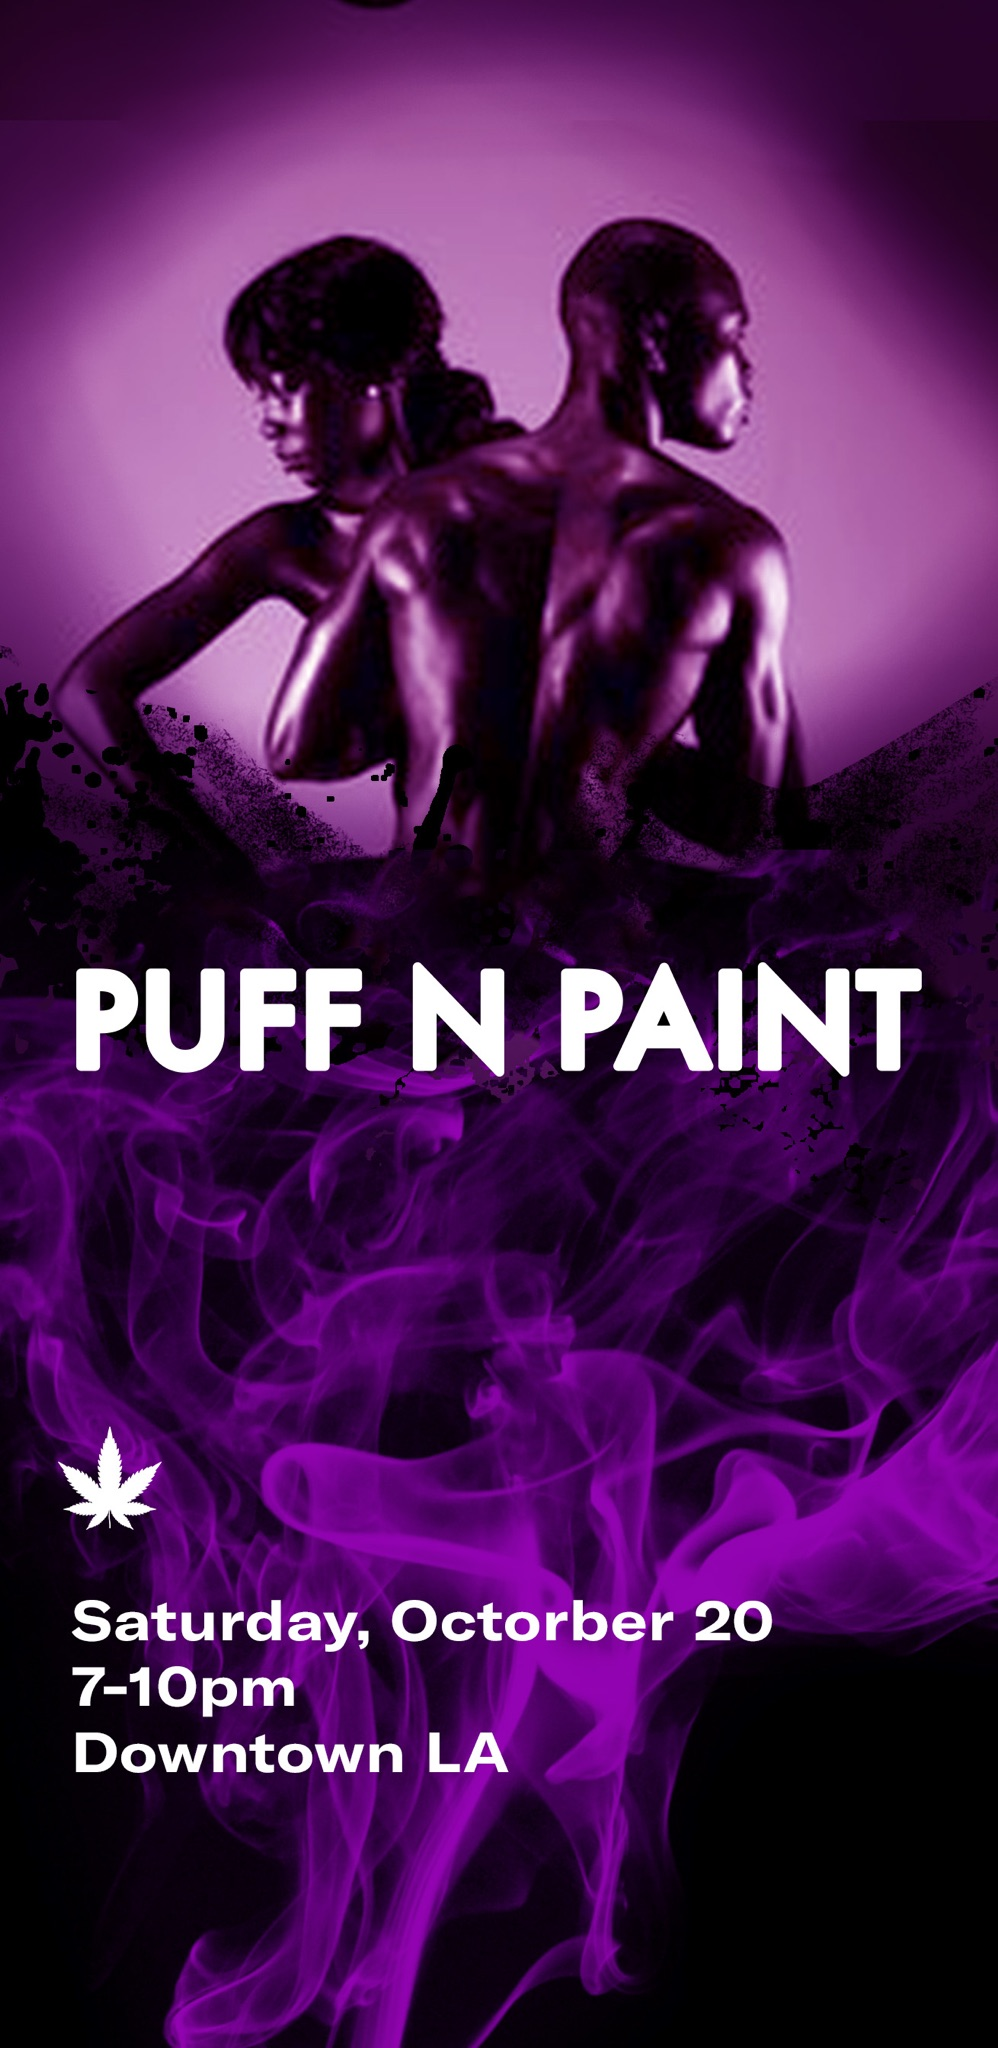 Puffn'PaintLA